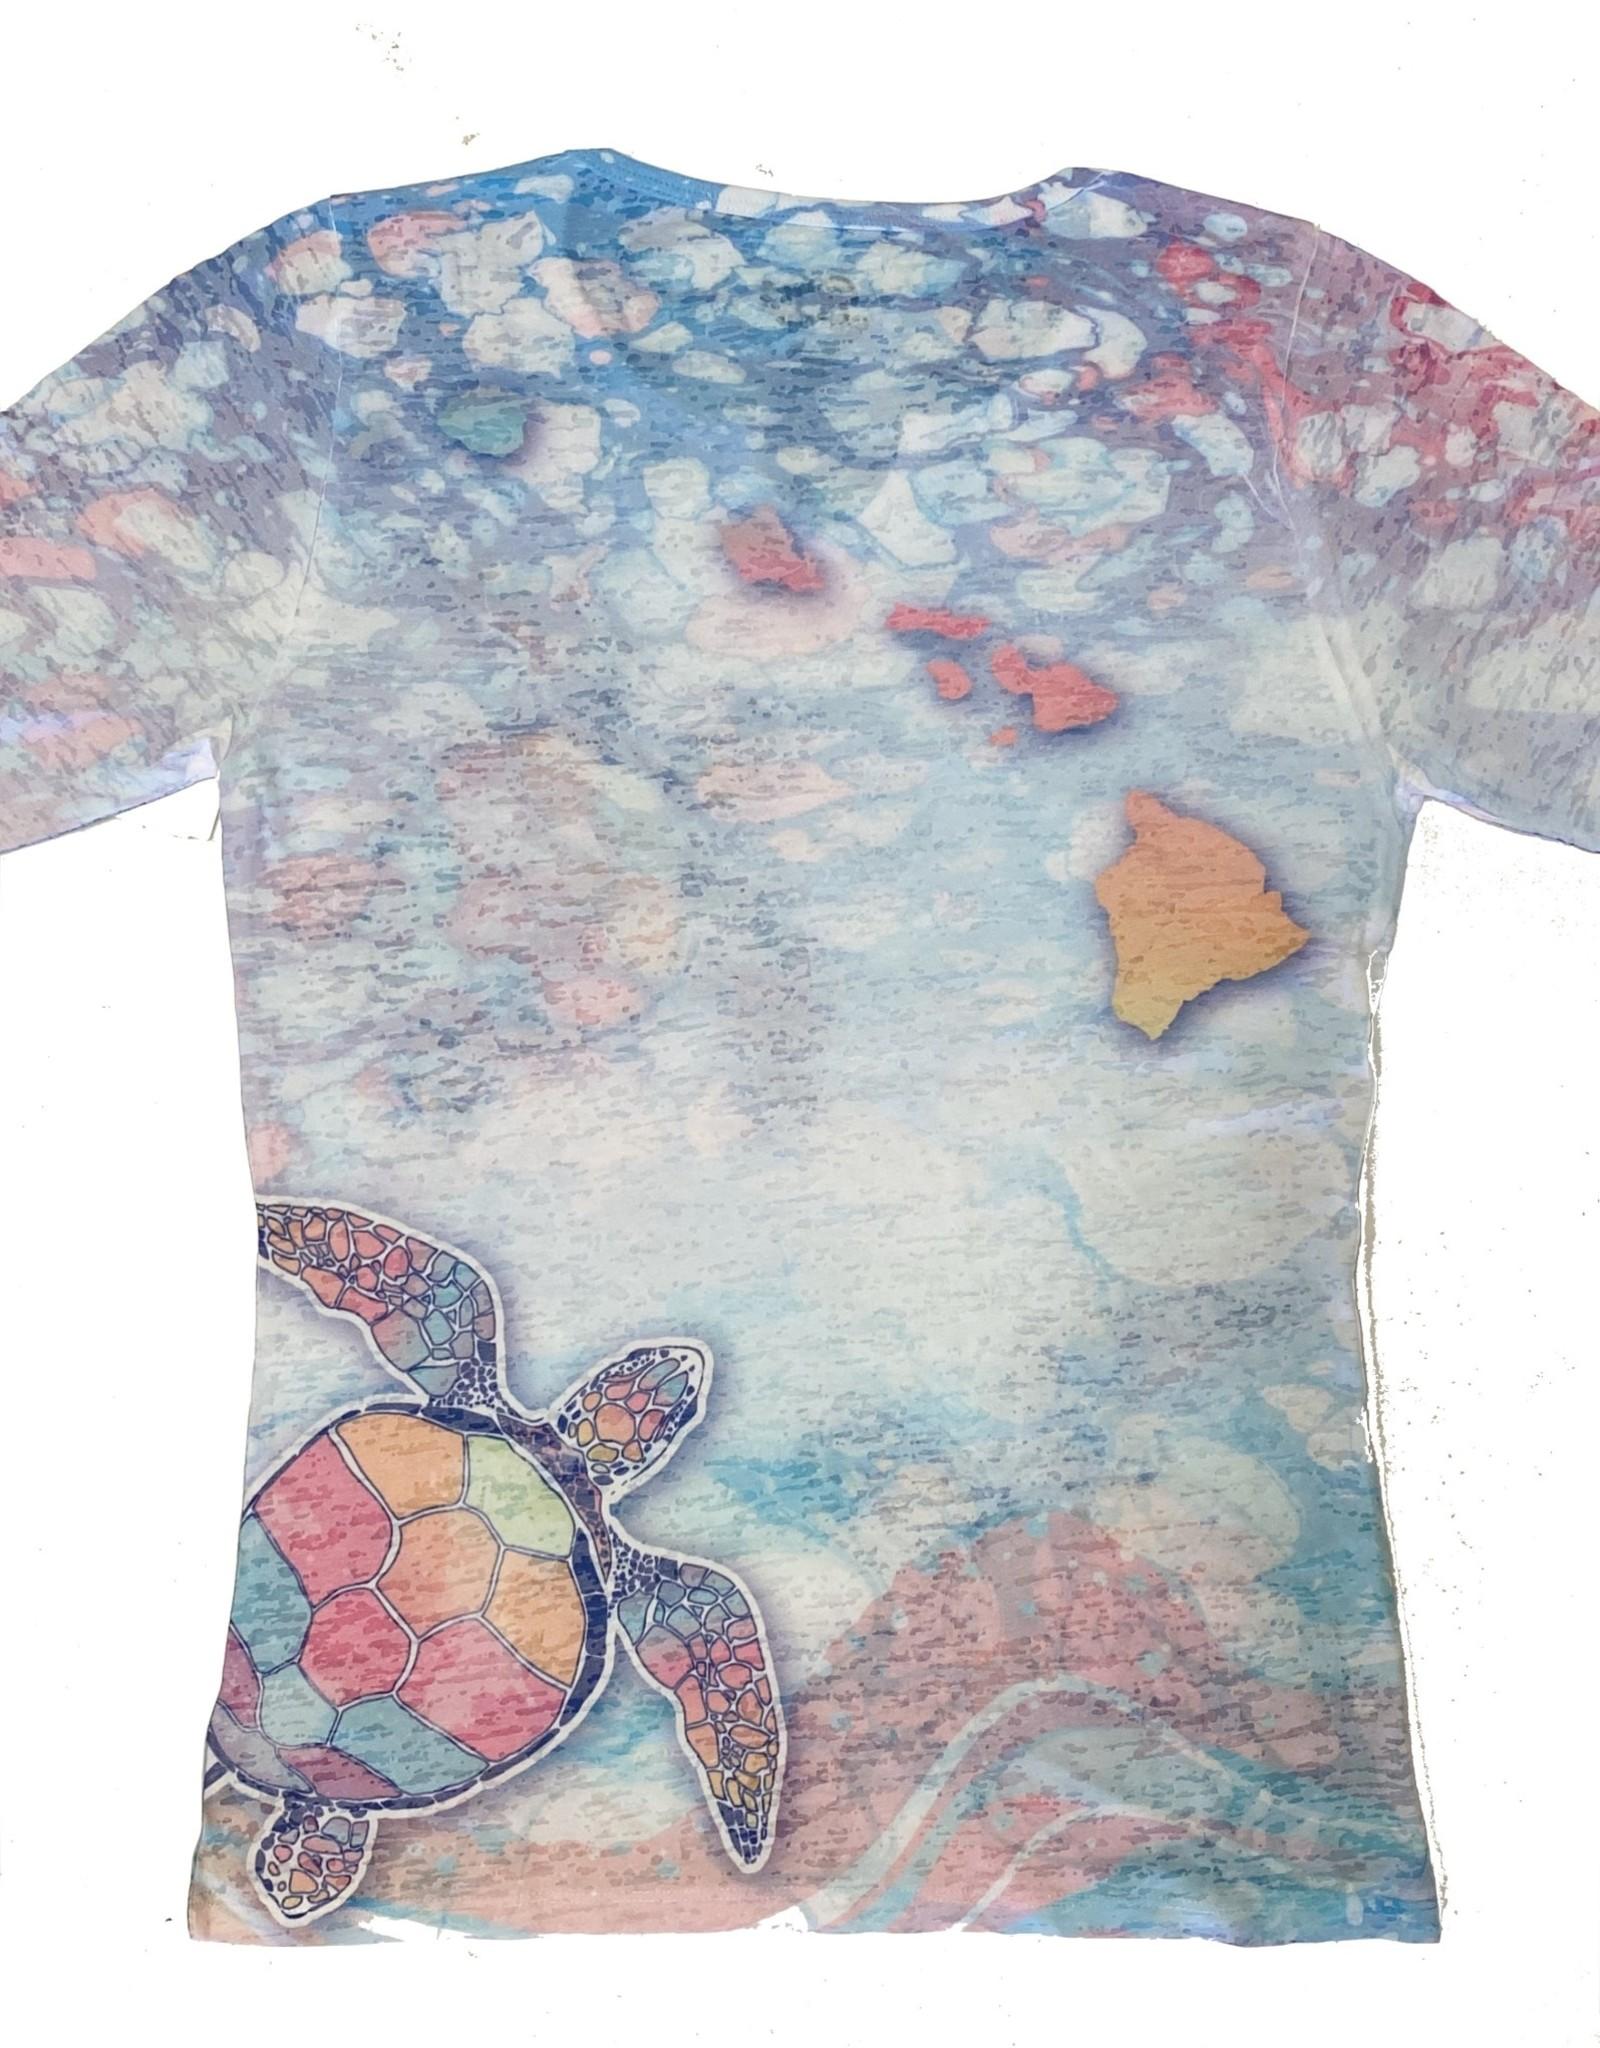 Blue 84 Eventful Turtles Turq Ladies Burnout 3/4 Sleeve T-Shirt